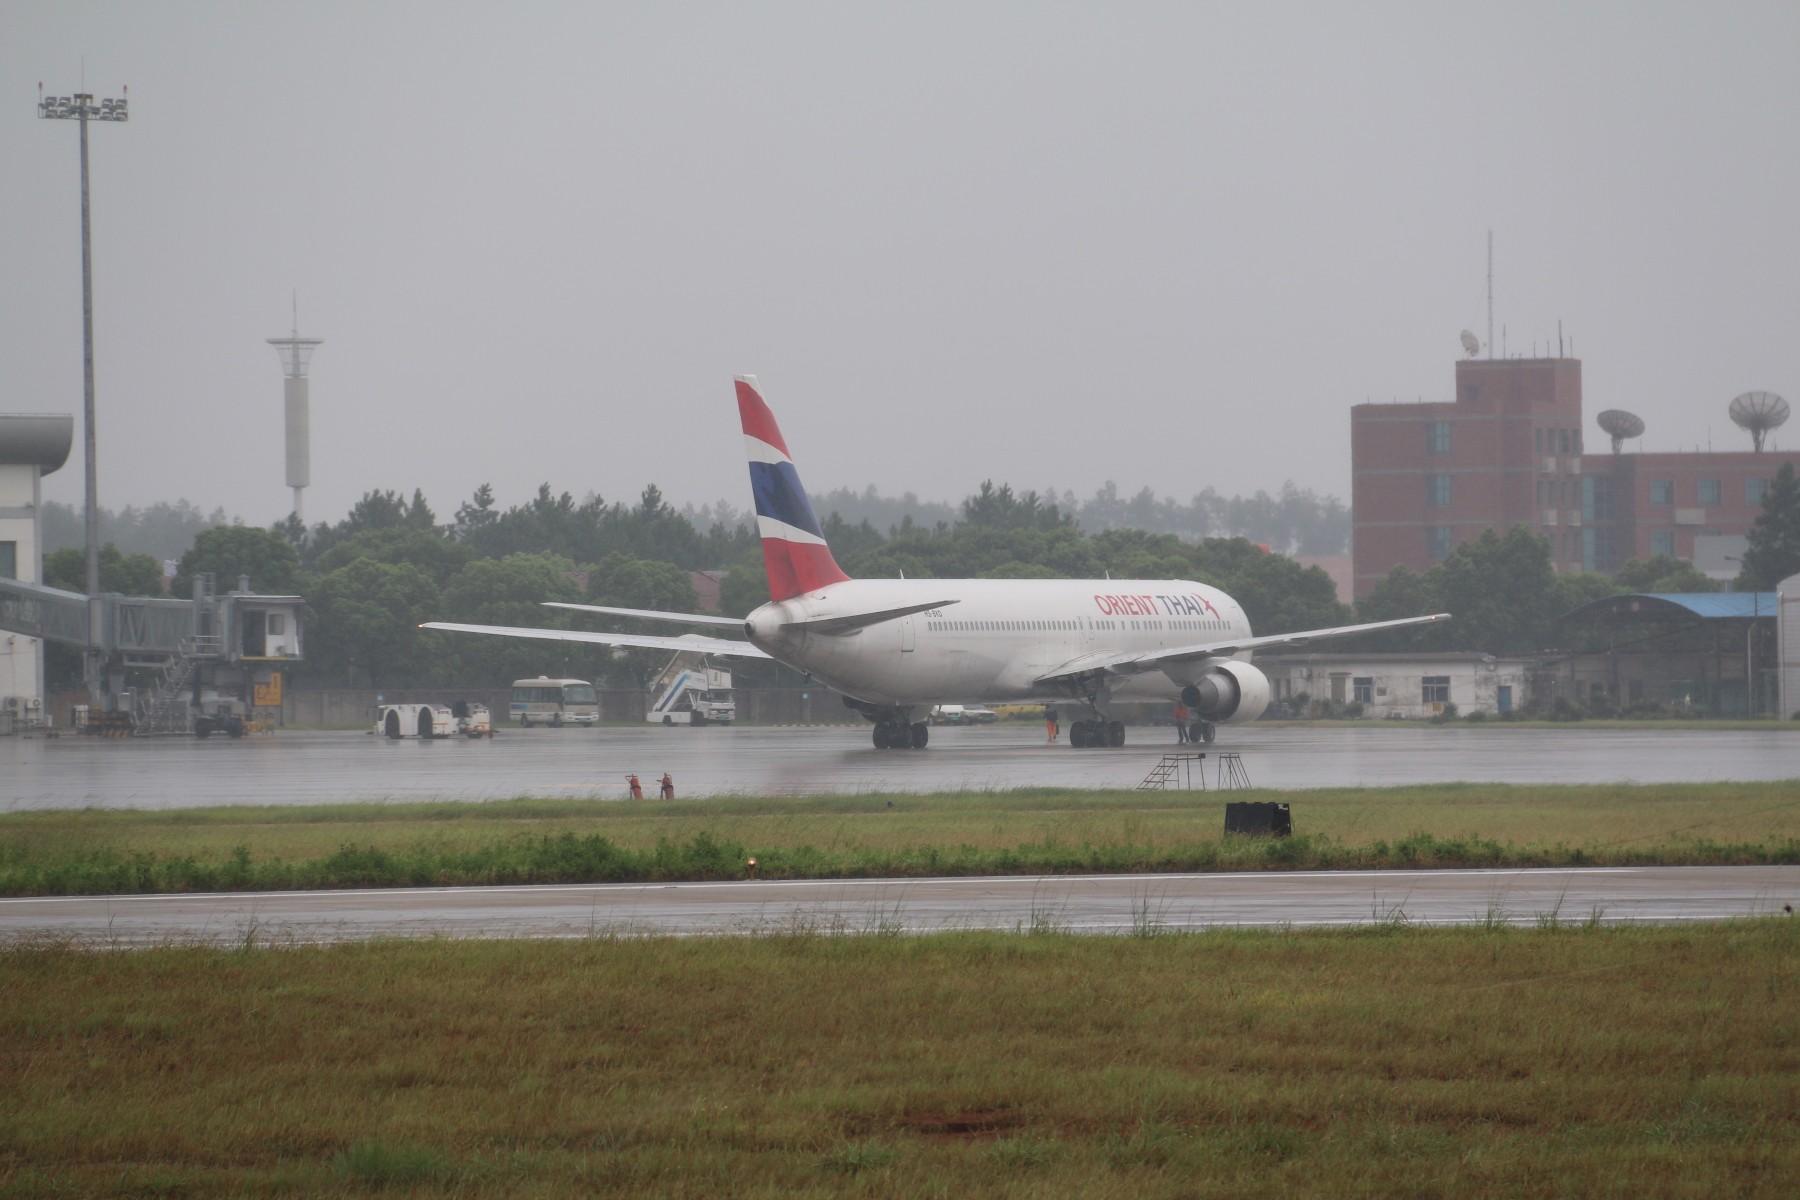 Re:[原创]【南昌飞友会】【1800*1200】暴雨大风中的KHN [17pic] BOEING 767-300 HS-BKD 中国南昌昌北国际机场